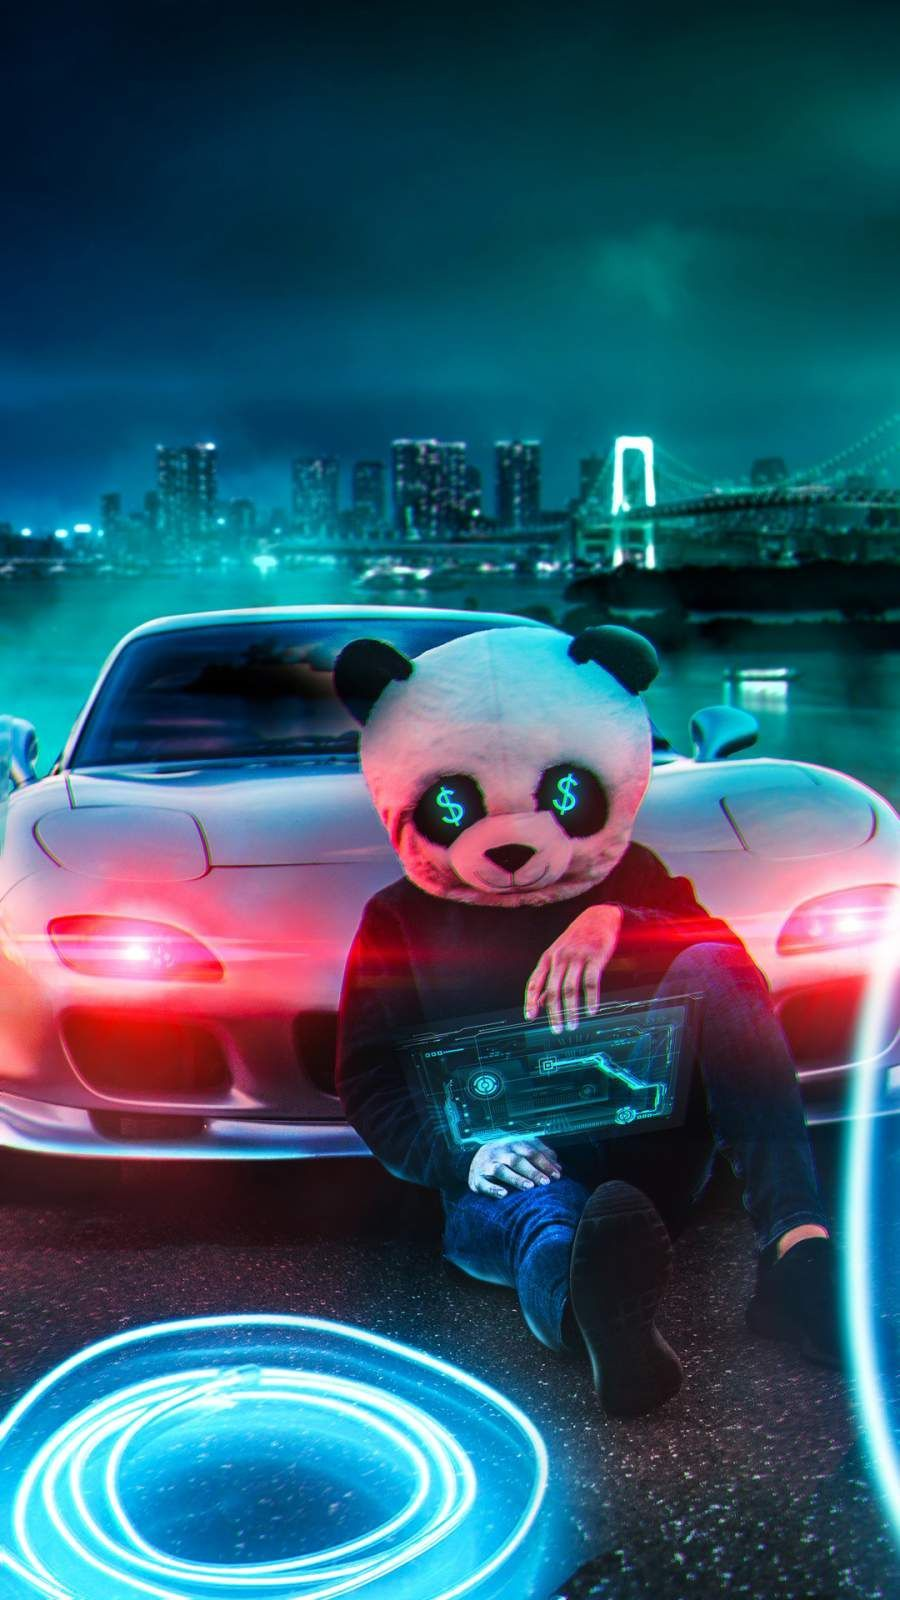 Neon Pandas Wallpapers Wallpaper Cave